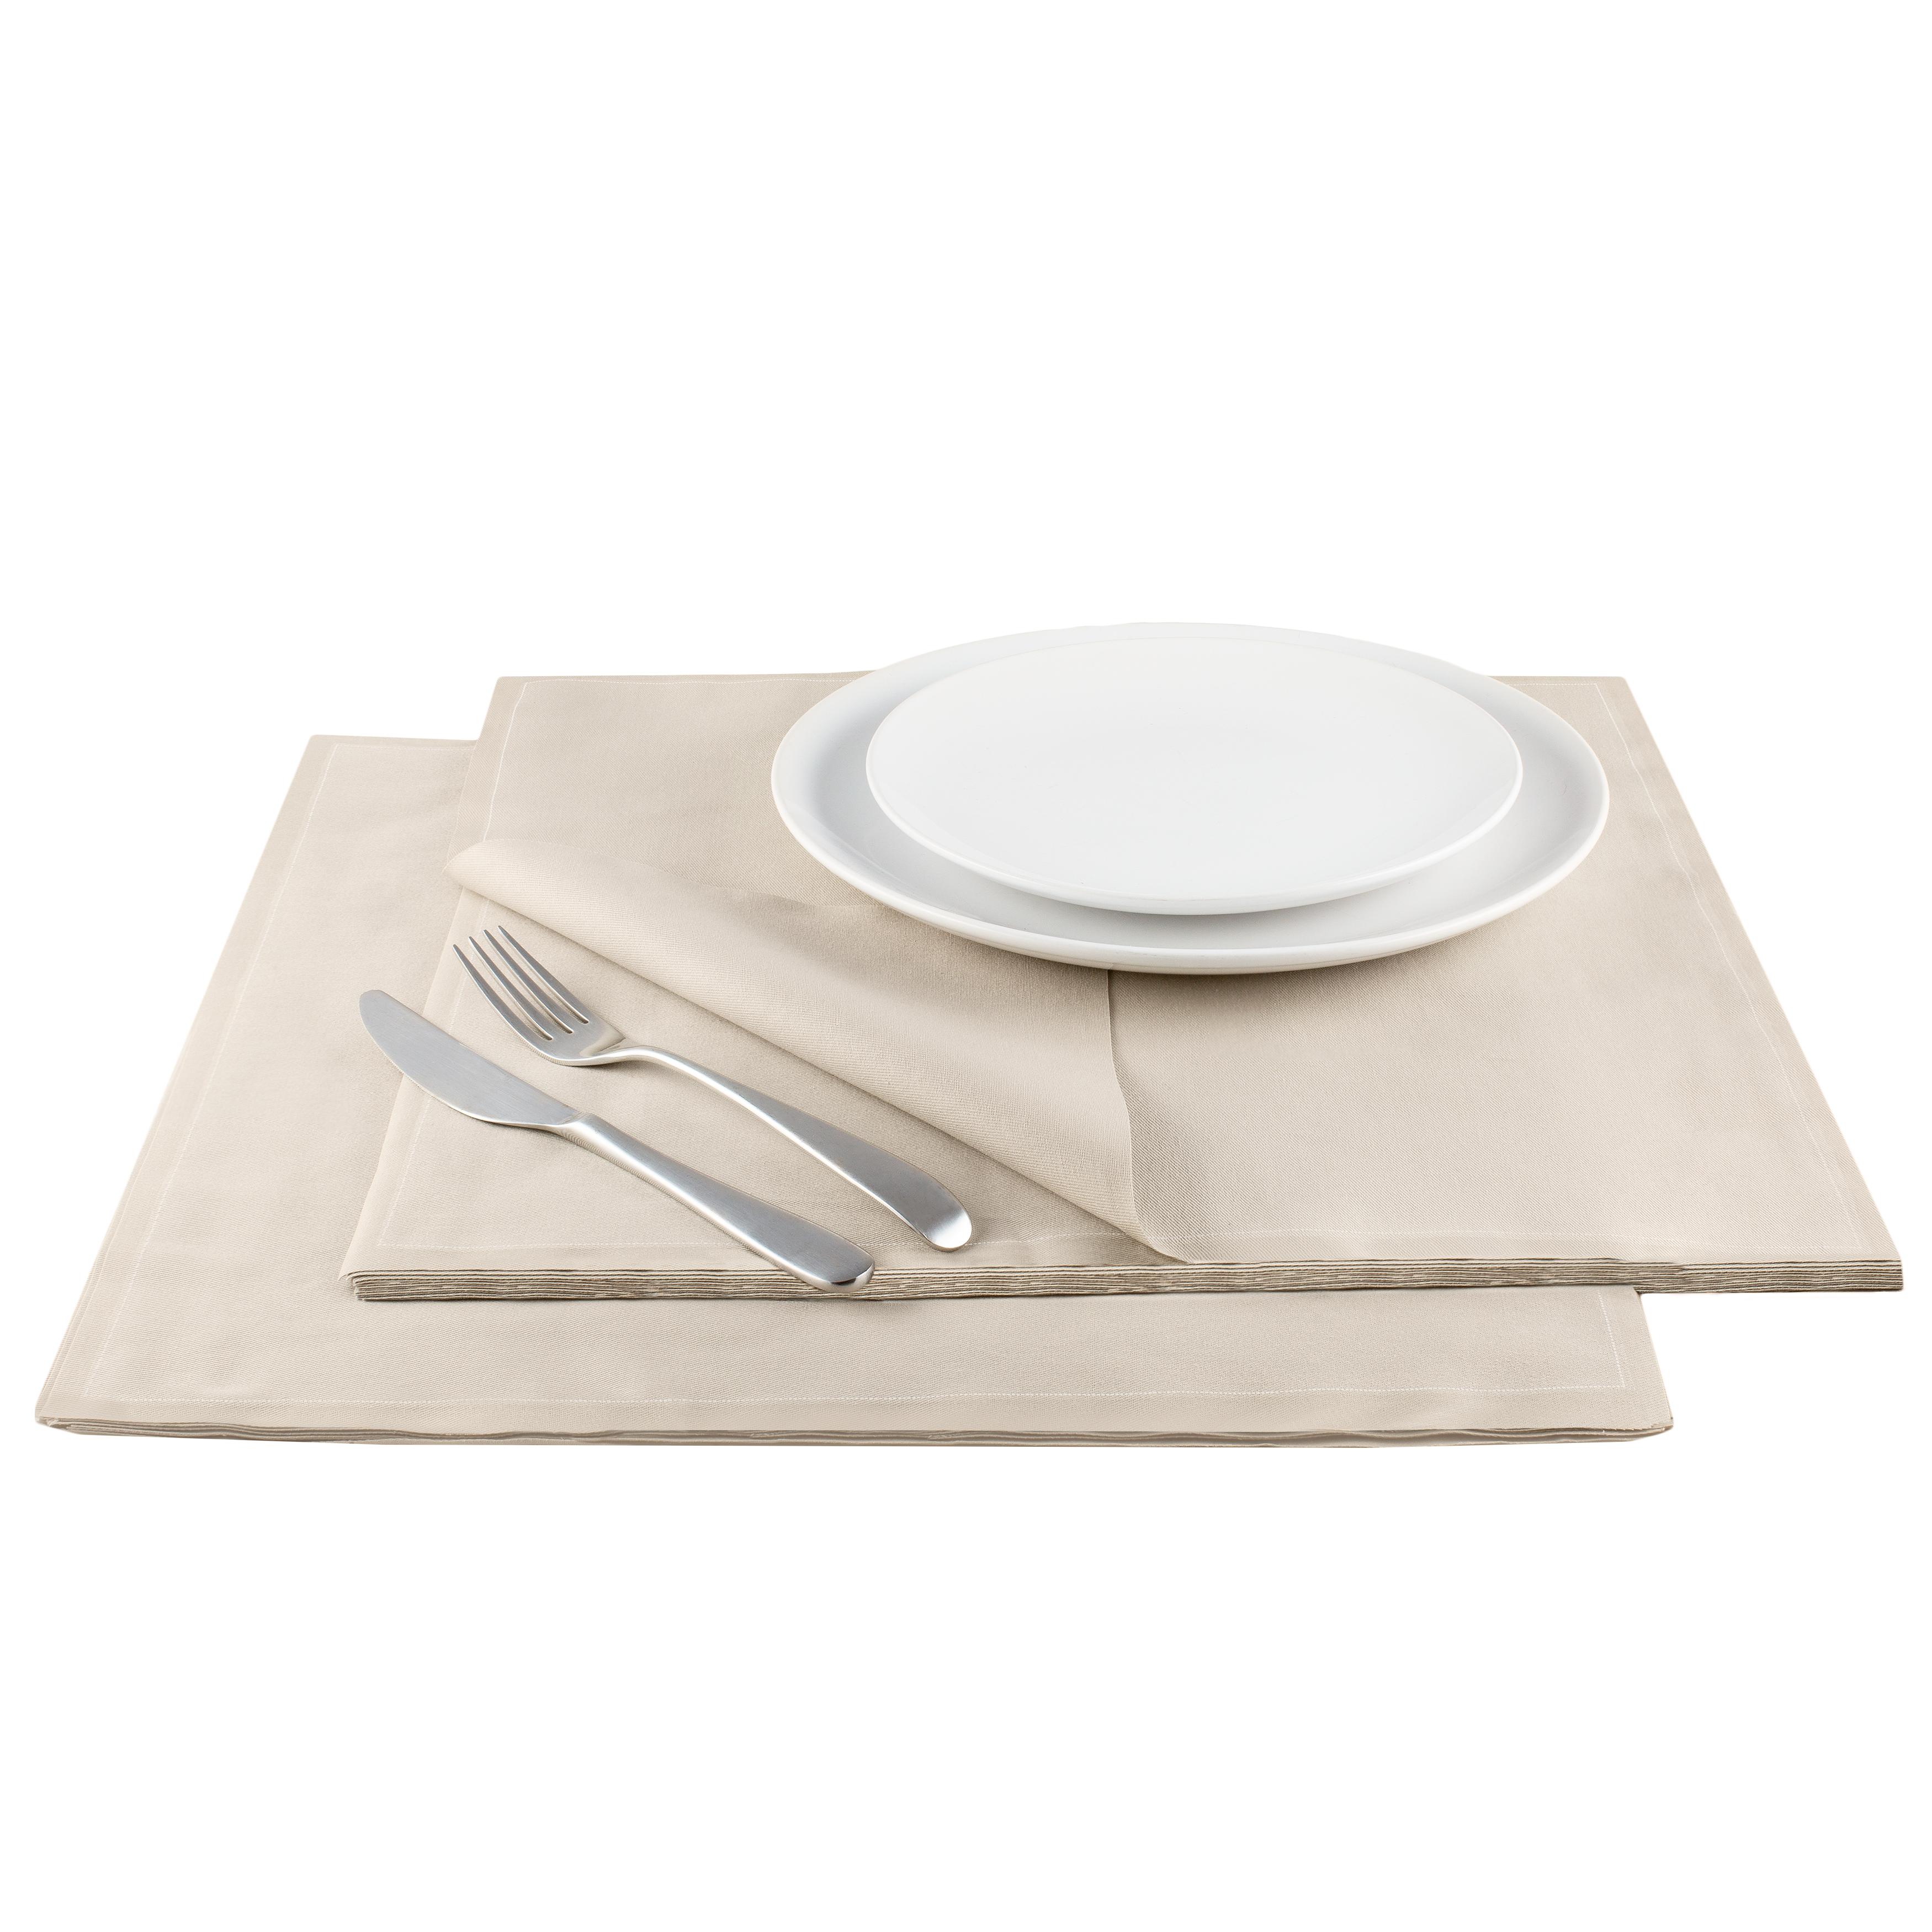 "Sand Cotton Premium Dinner - 15.8"" x 15.8"" - 25 Units"